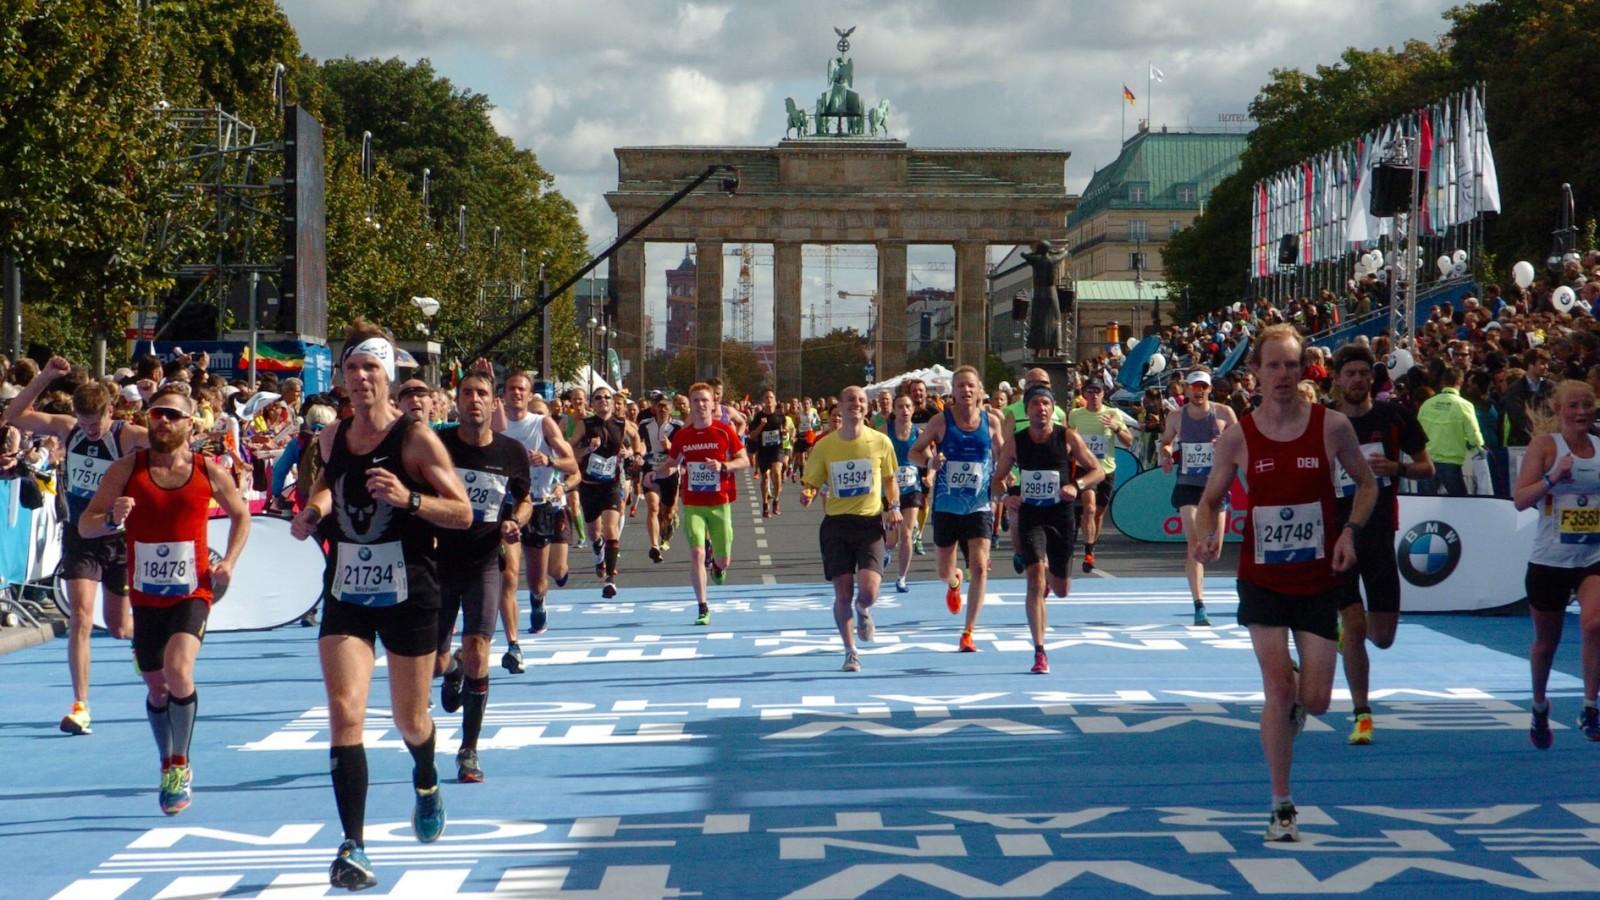 Berlin marathon finish line